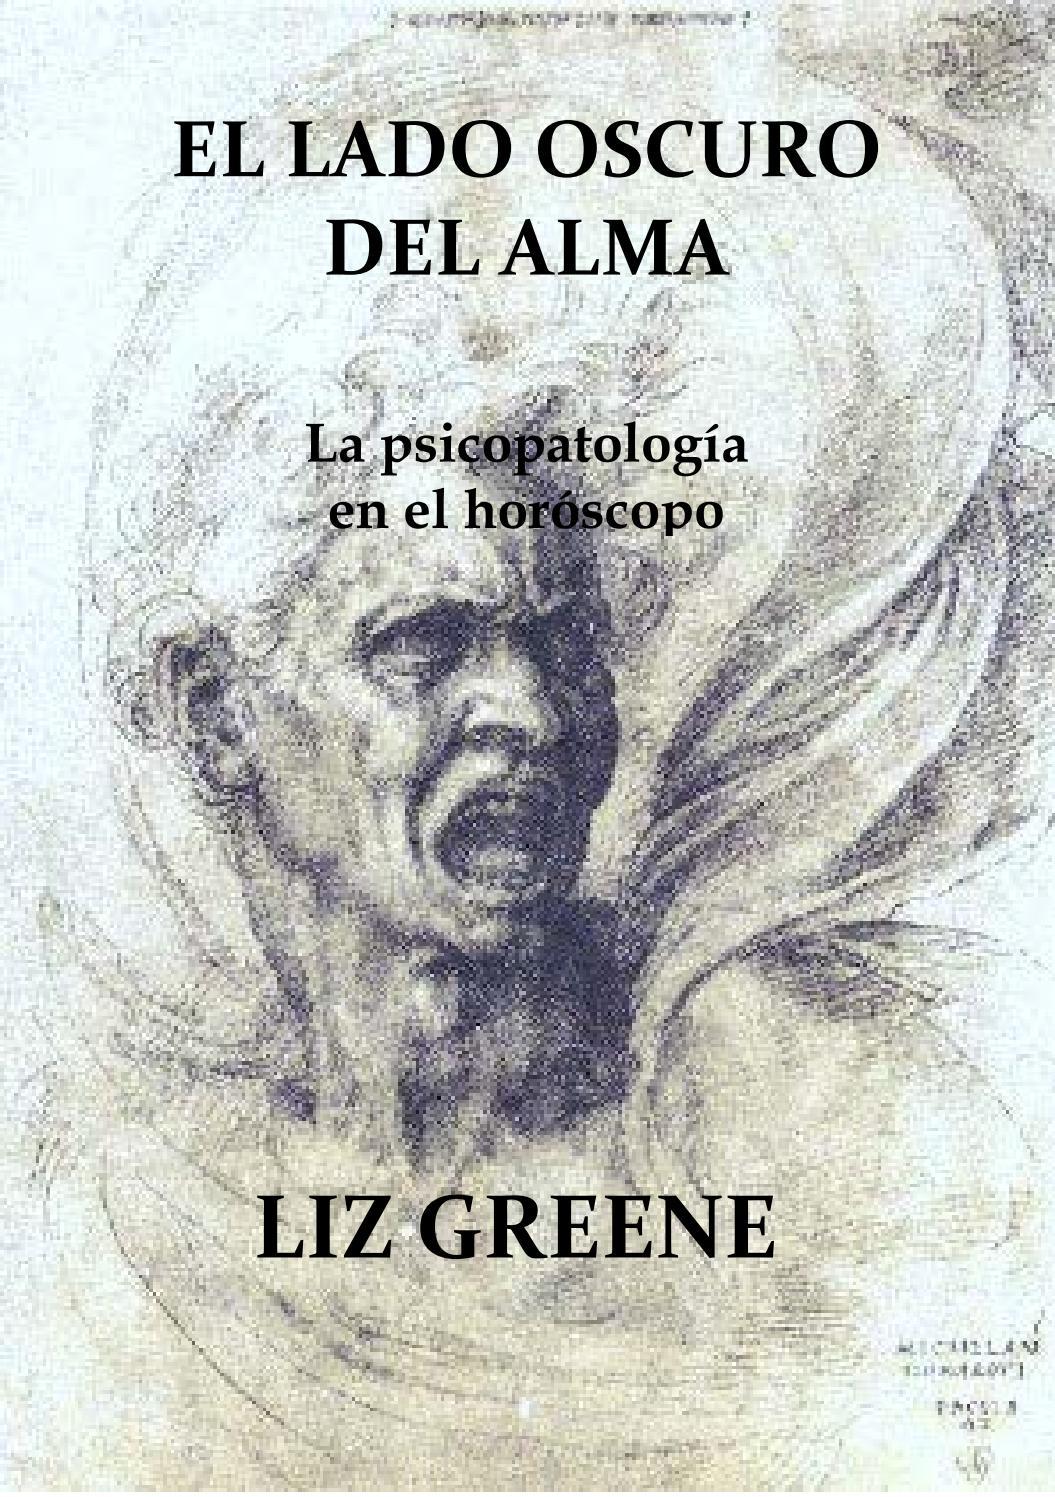 Liz Greene - El lado oscuro del alma by Piotr Library - issuu